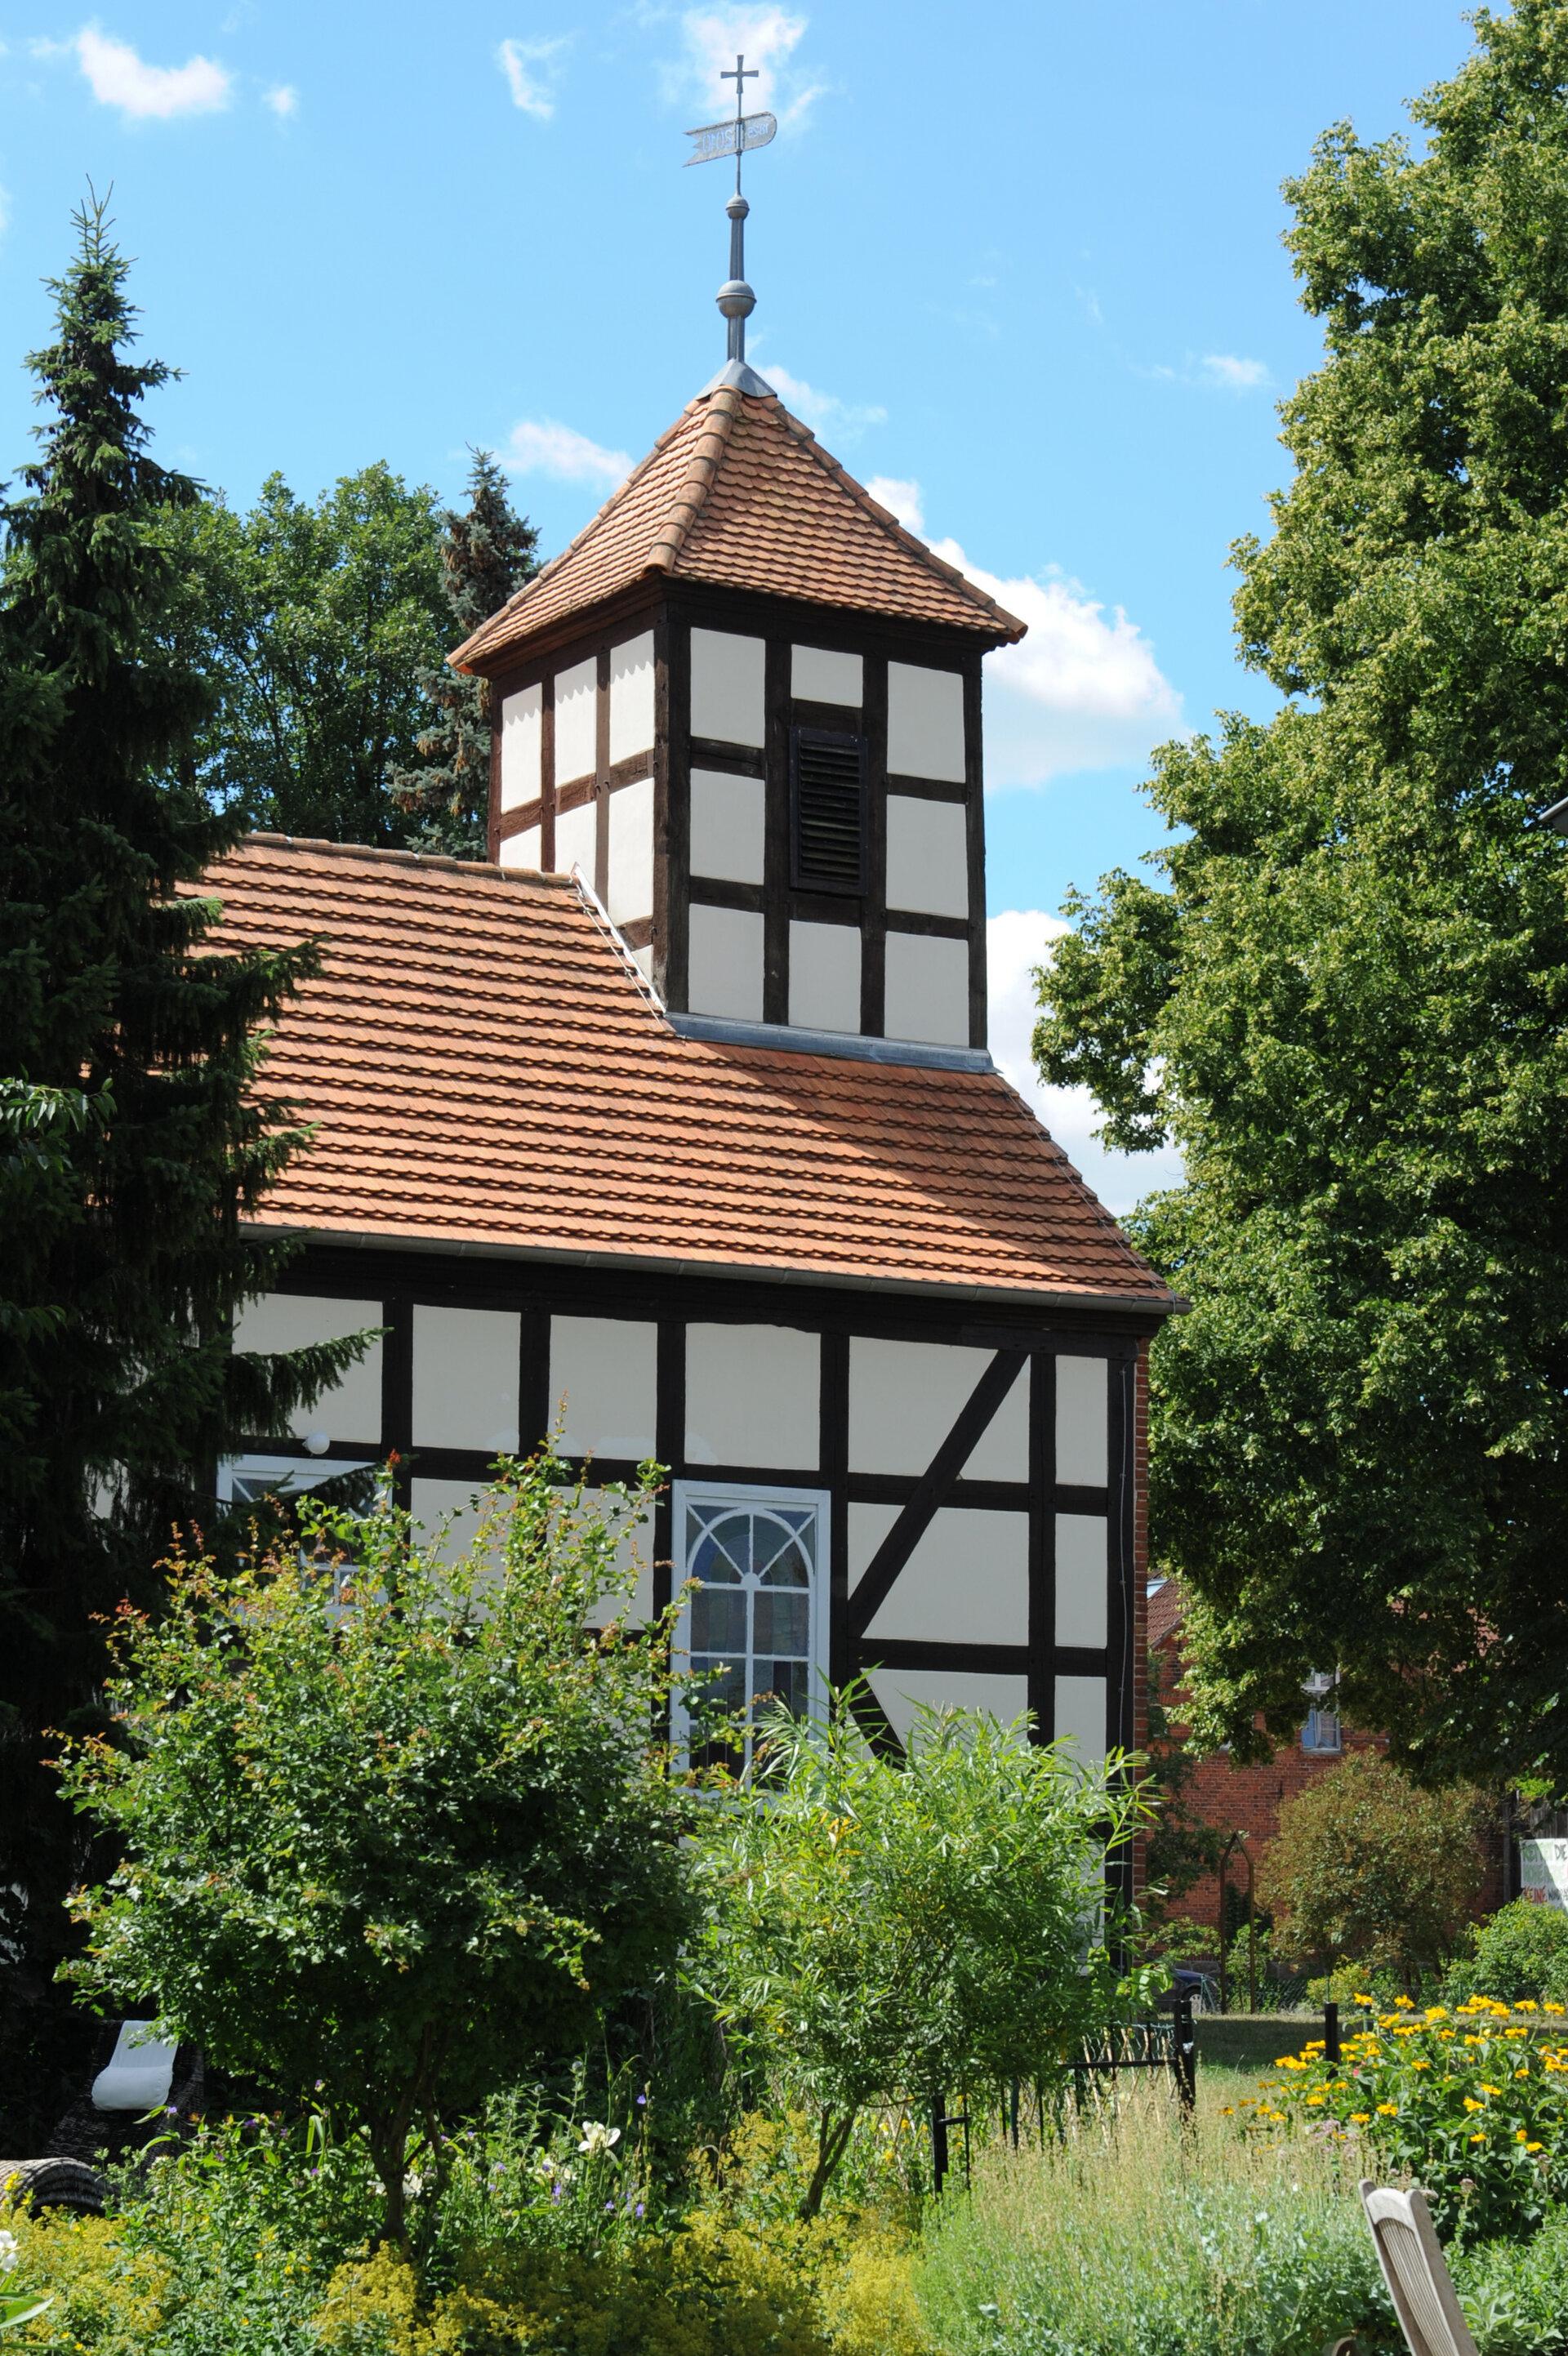 Kirche Bölzke. Foto: Uta Süße-Krause